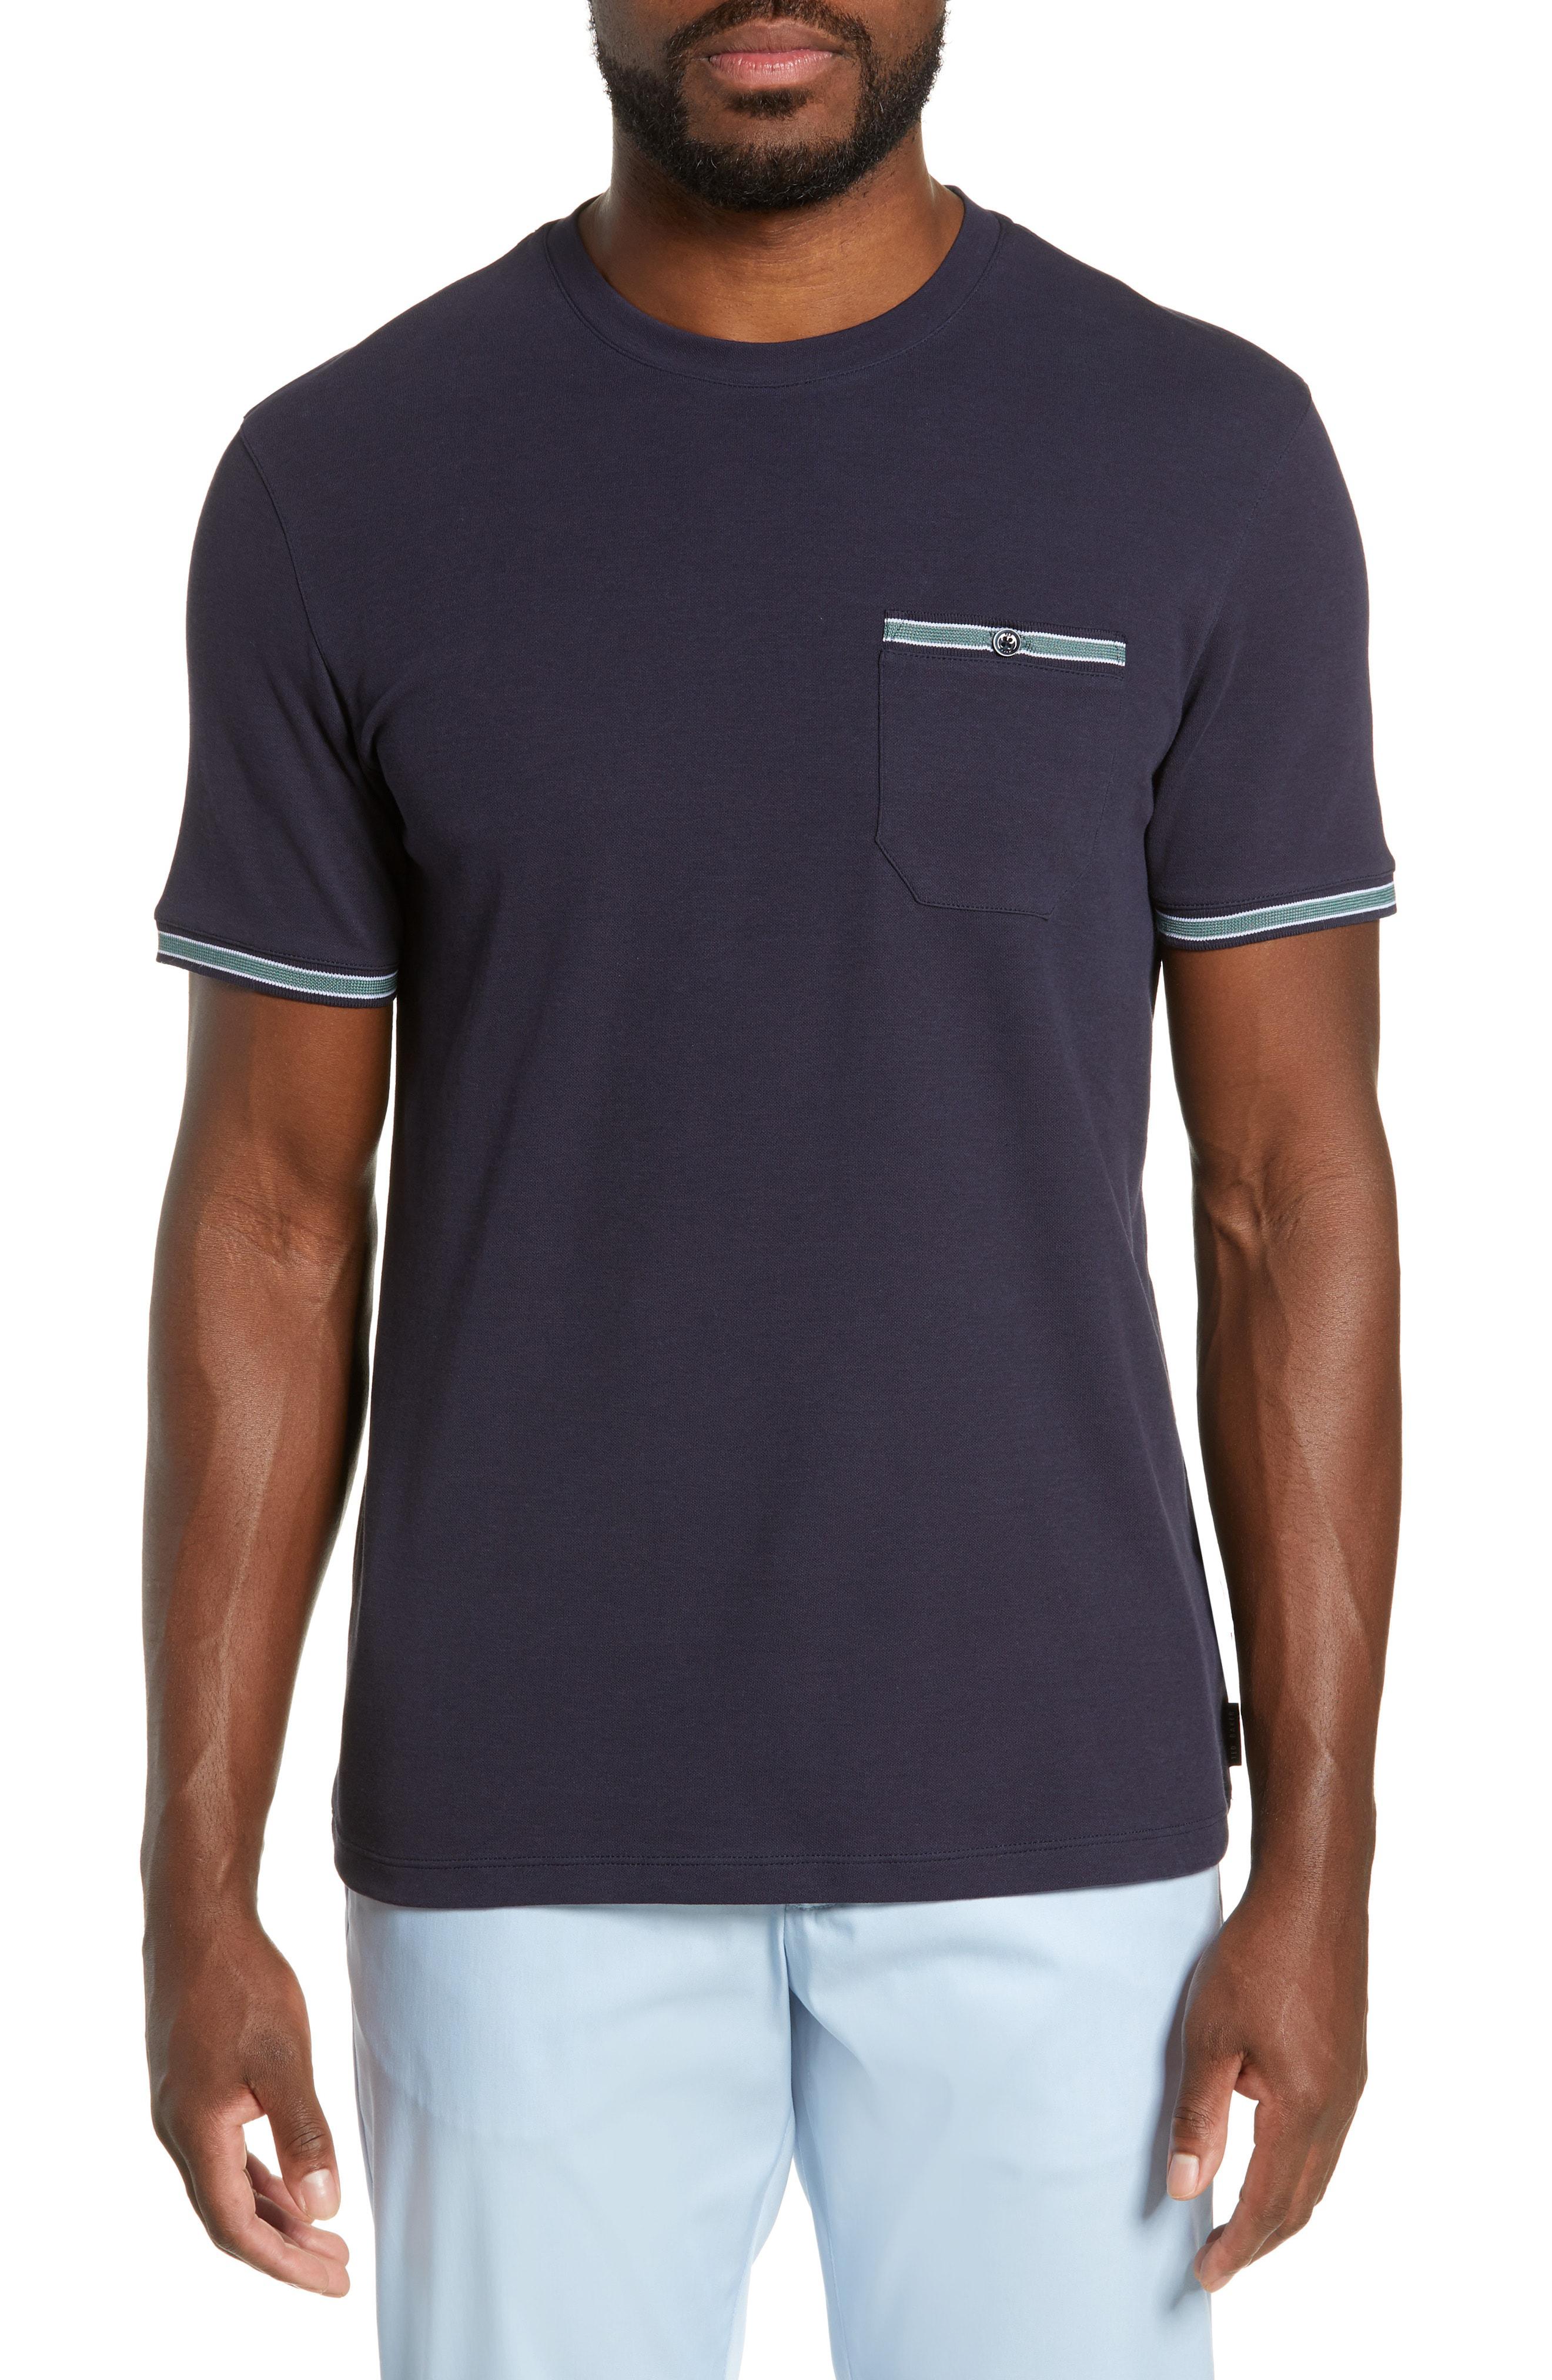 Ted Baker Khaos Slim Fit T-Shirt In Navy